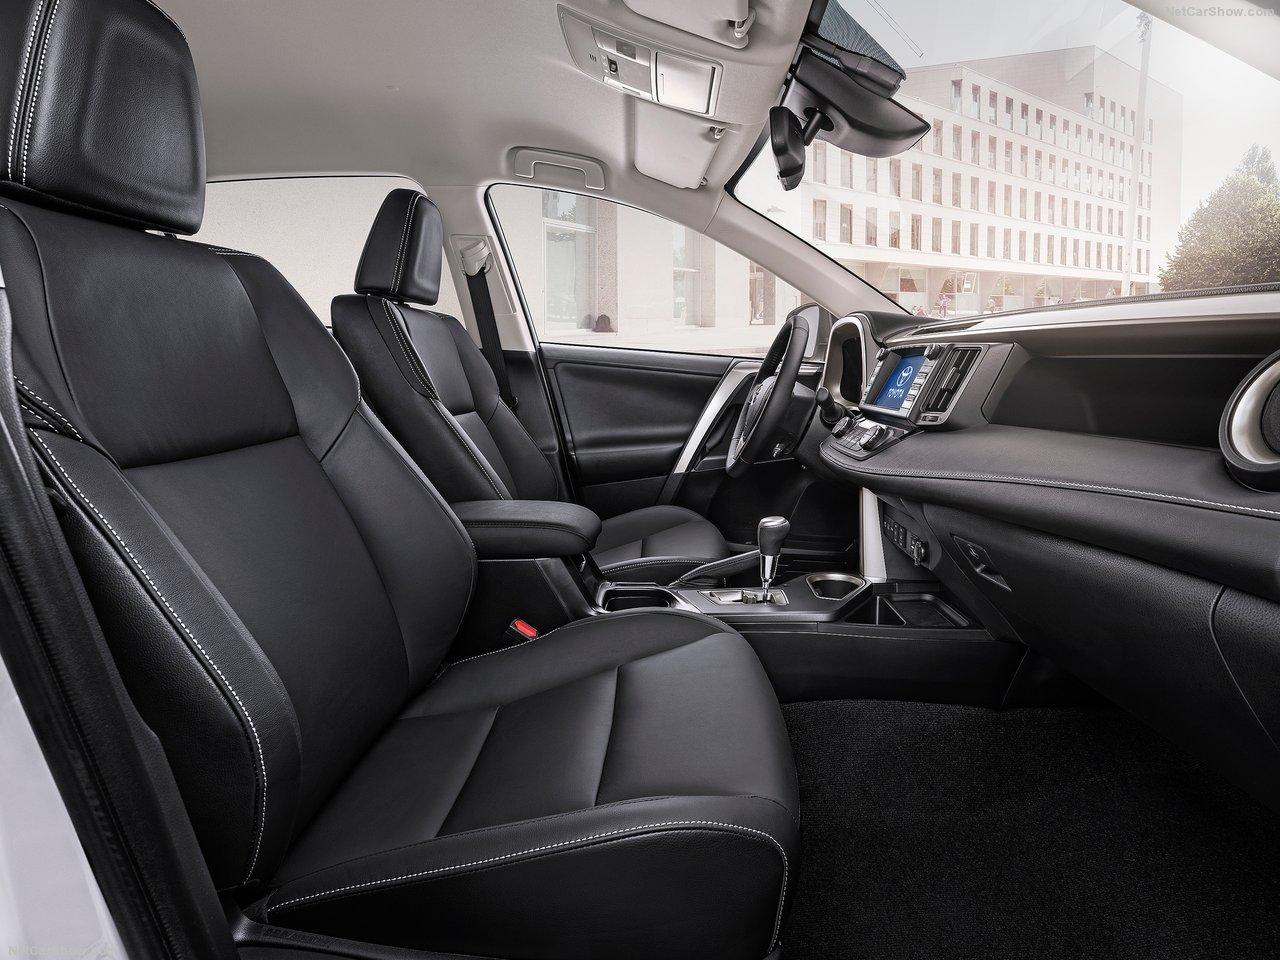 Toyota-RAV4_Hybrid_EU-Version_2016_1280x960_wallpaper_2c